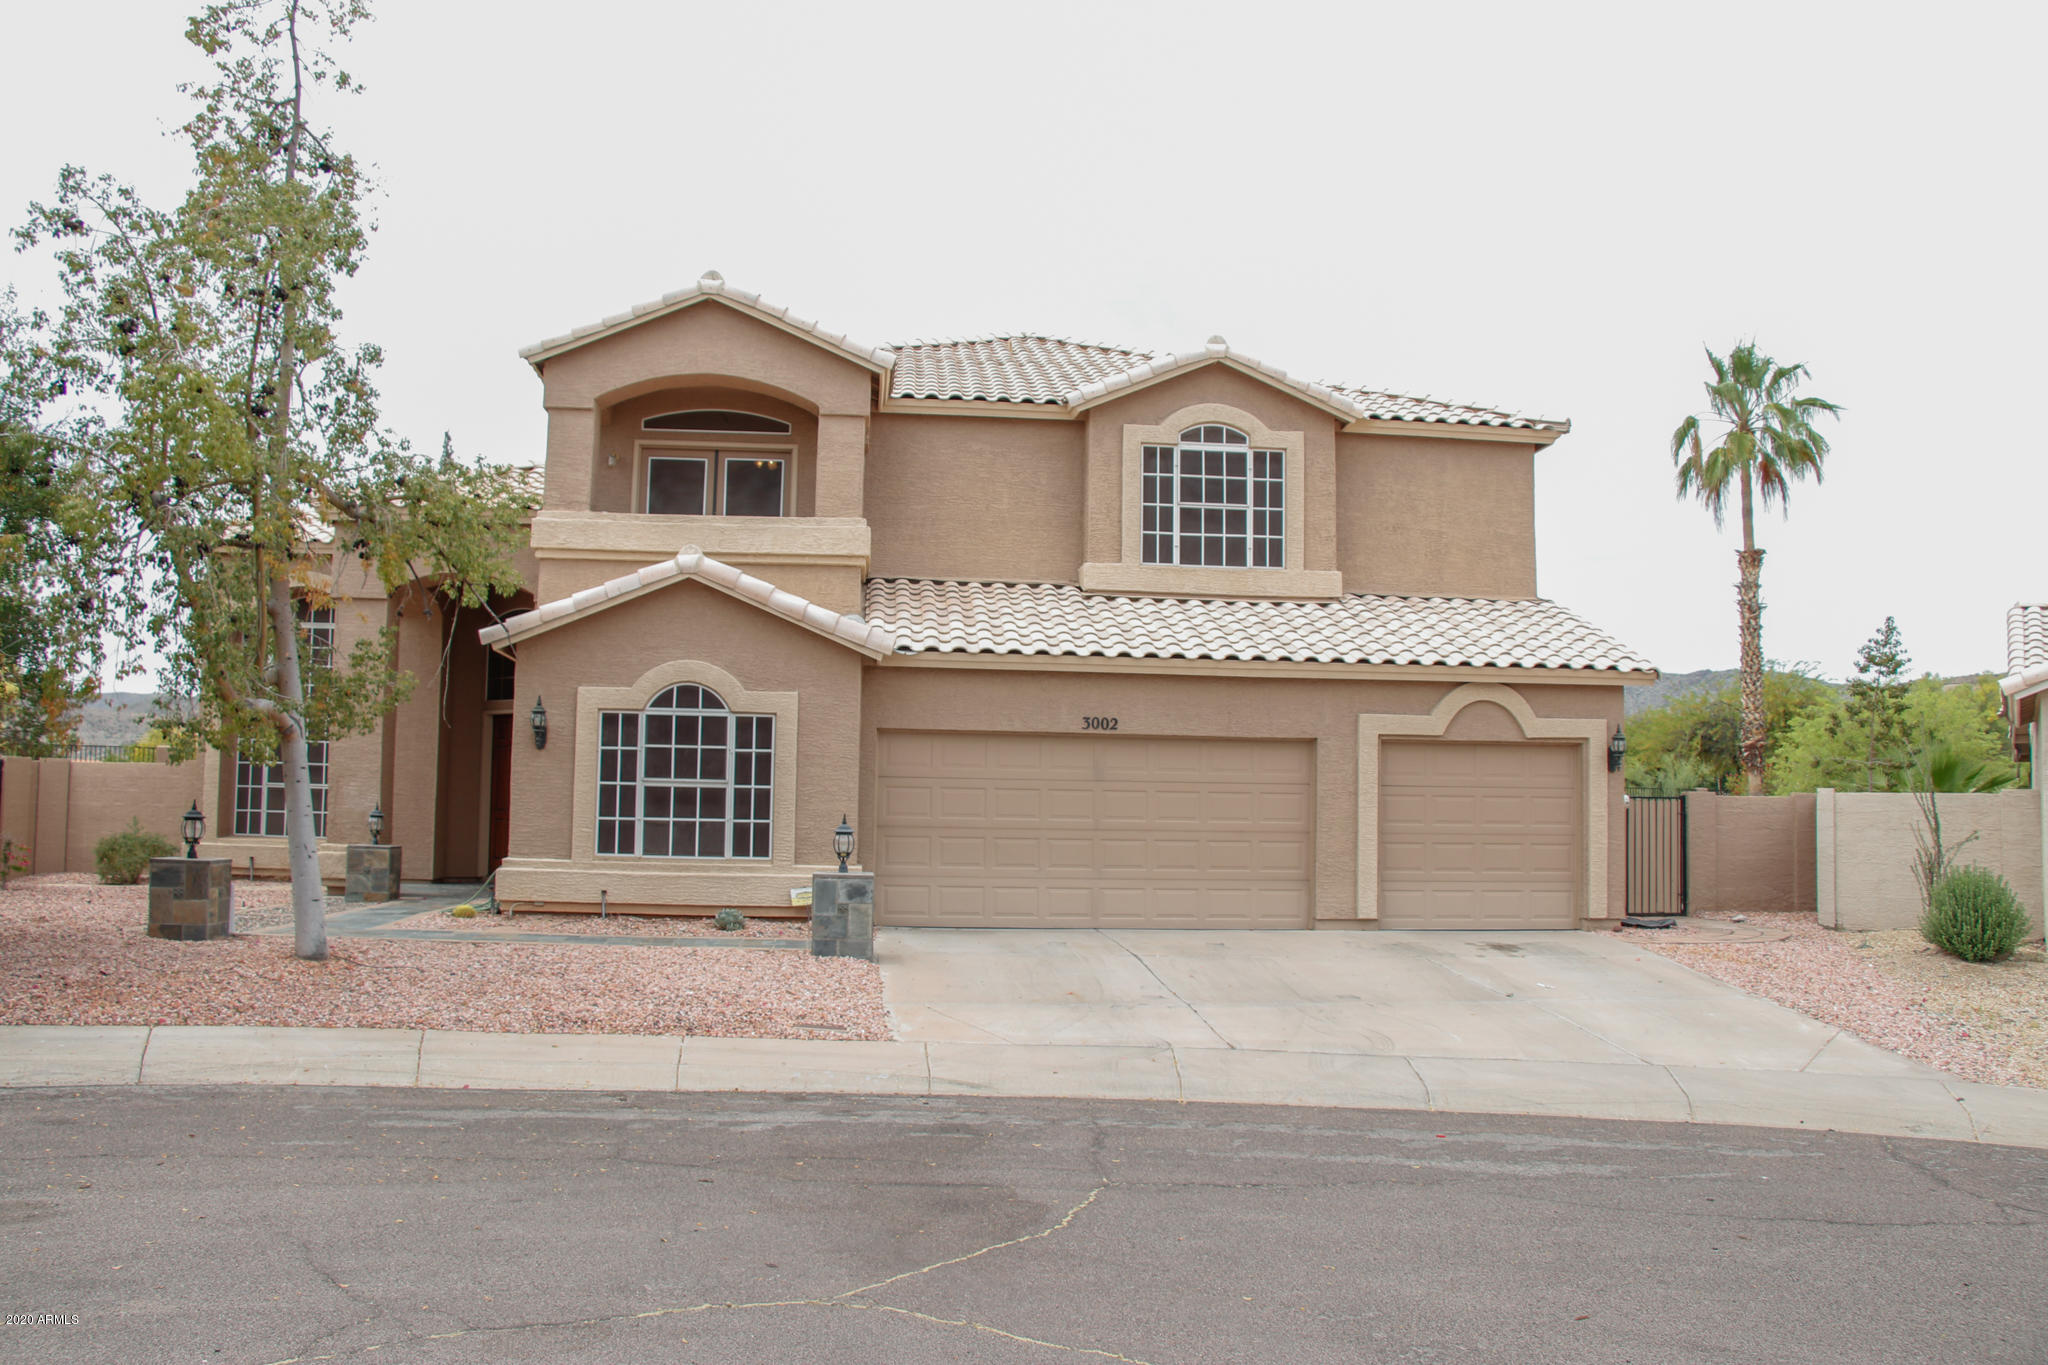 Photo of 3002 E THUNDERHILL Place E, Phoenix, AZ 85048